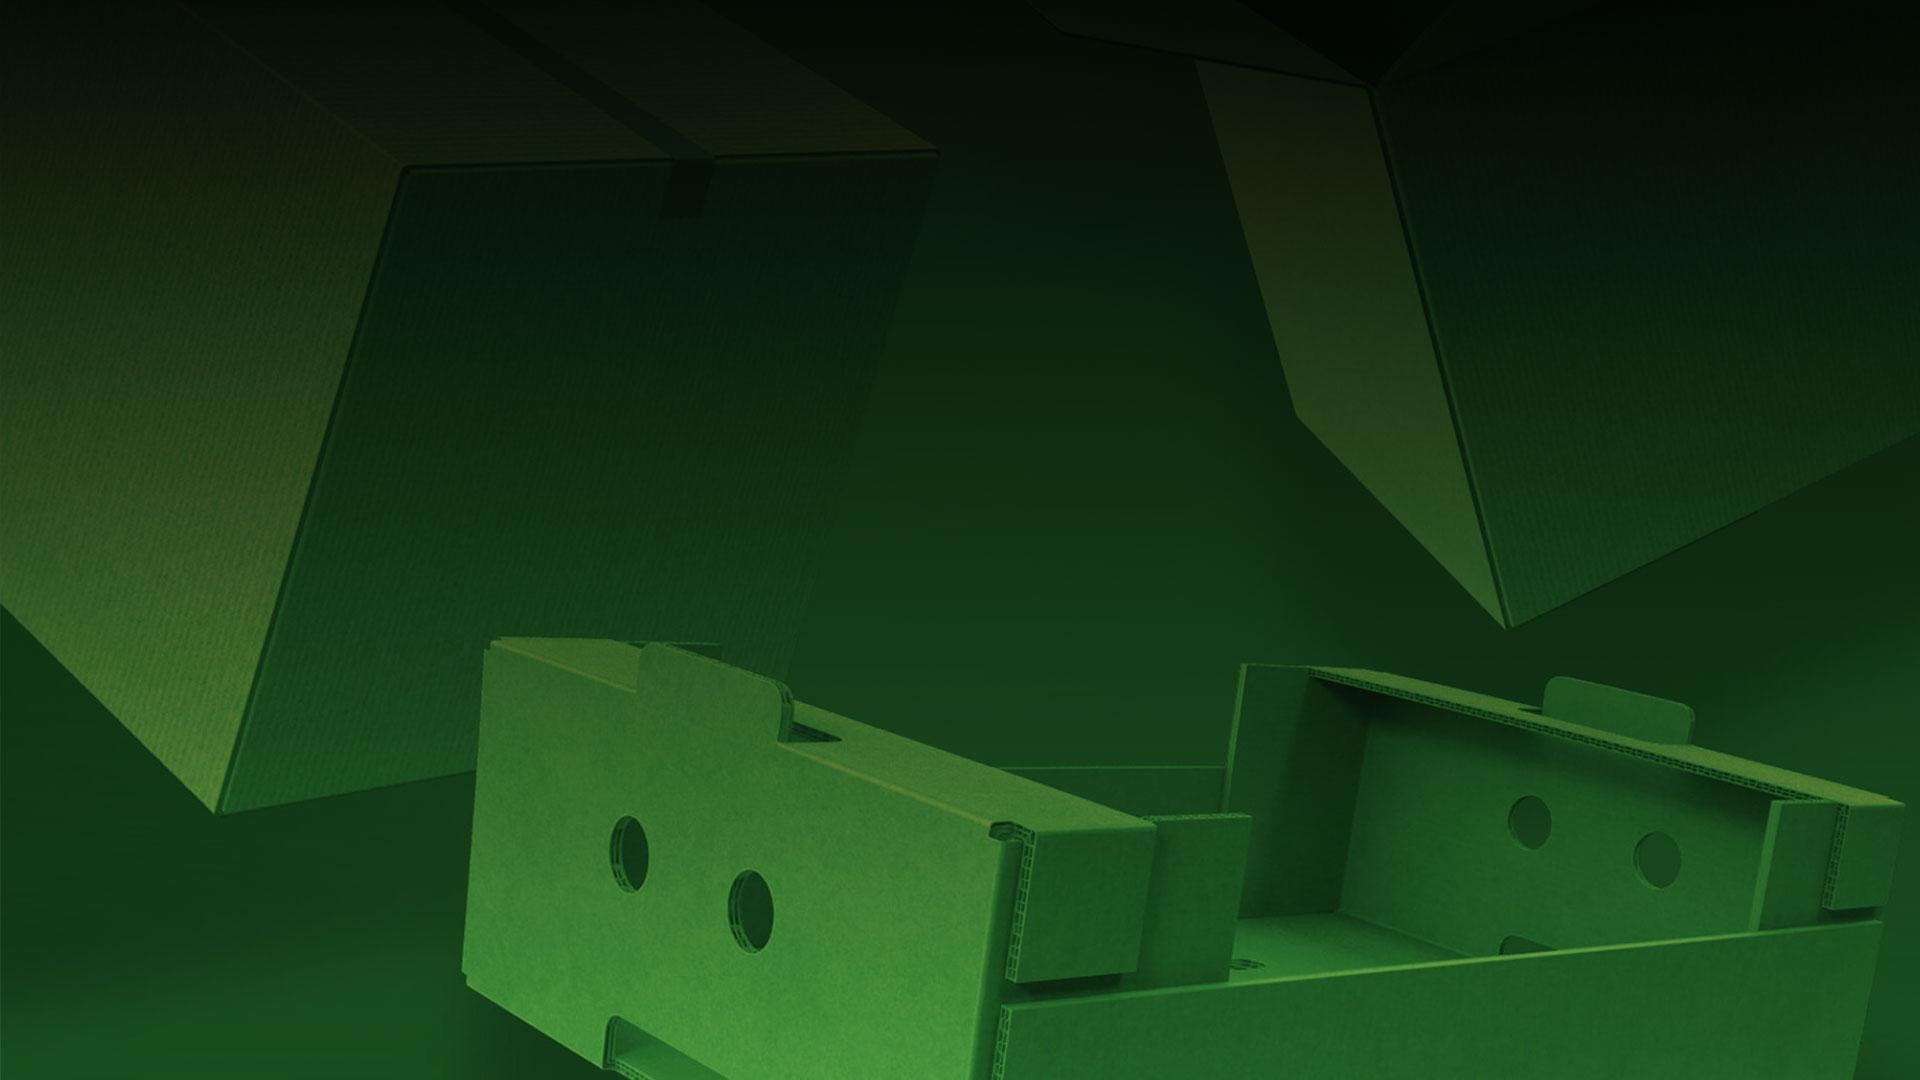 EndFlex green background image